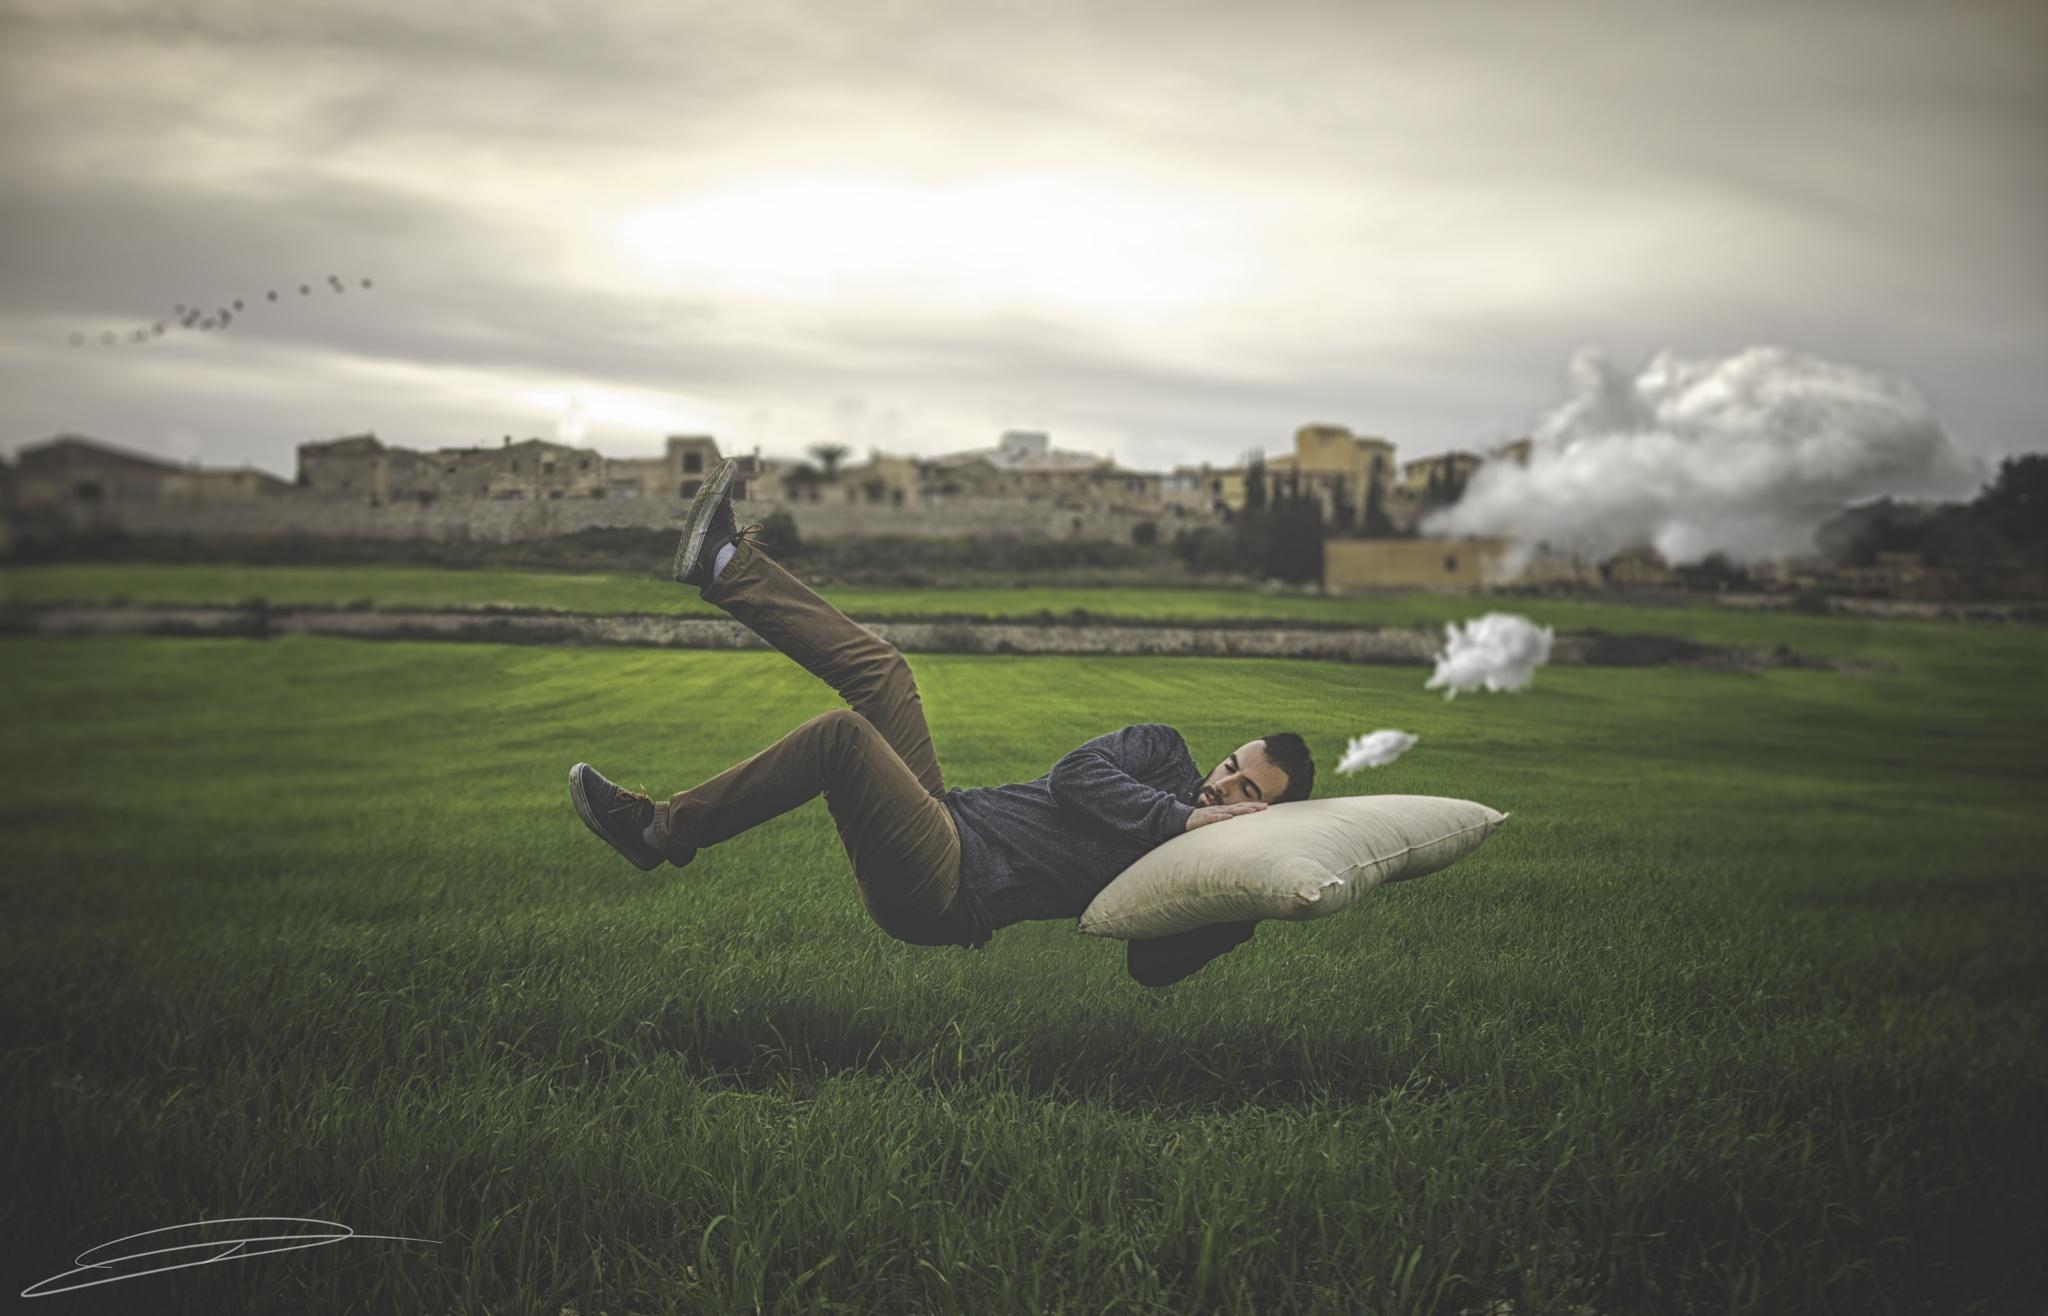 Dreaming by Daniel Gómez Suasi